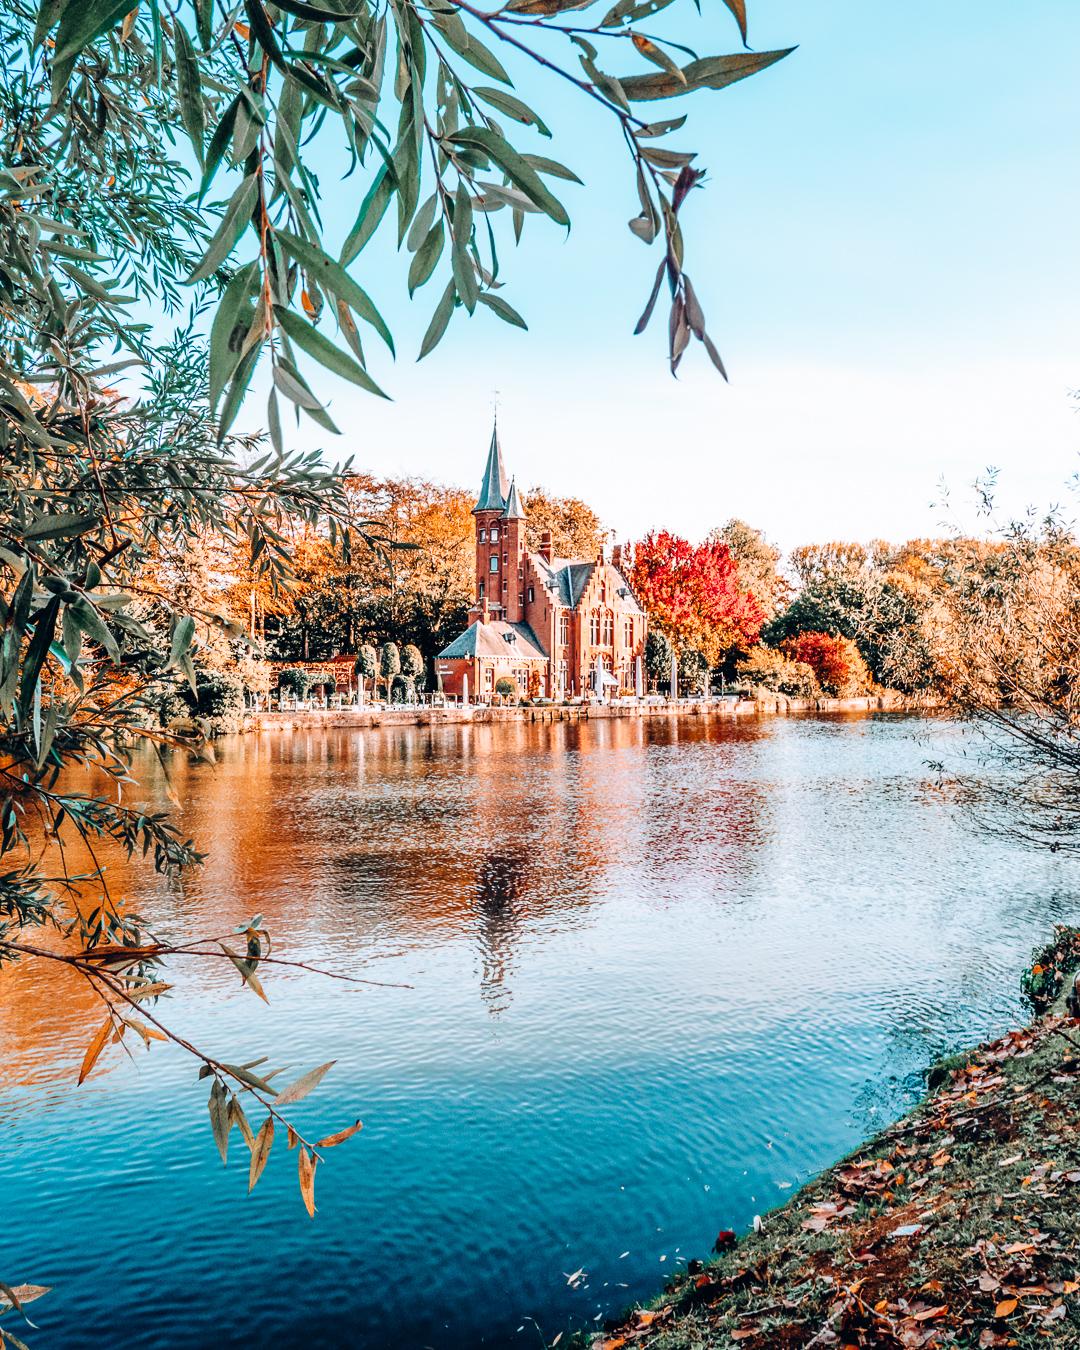 Fall in a city in Belgium